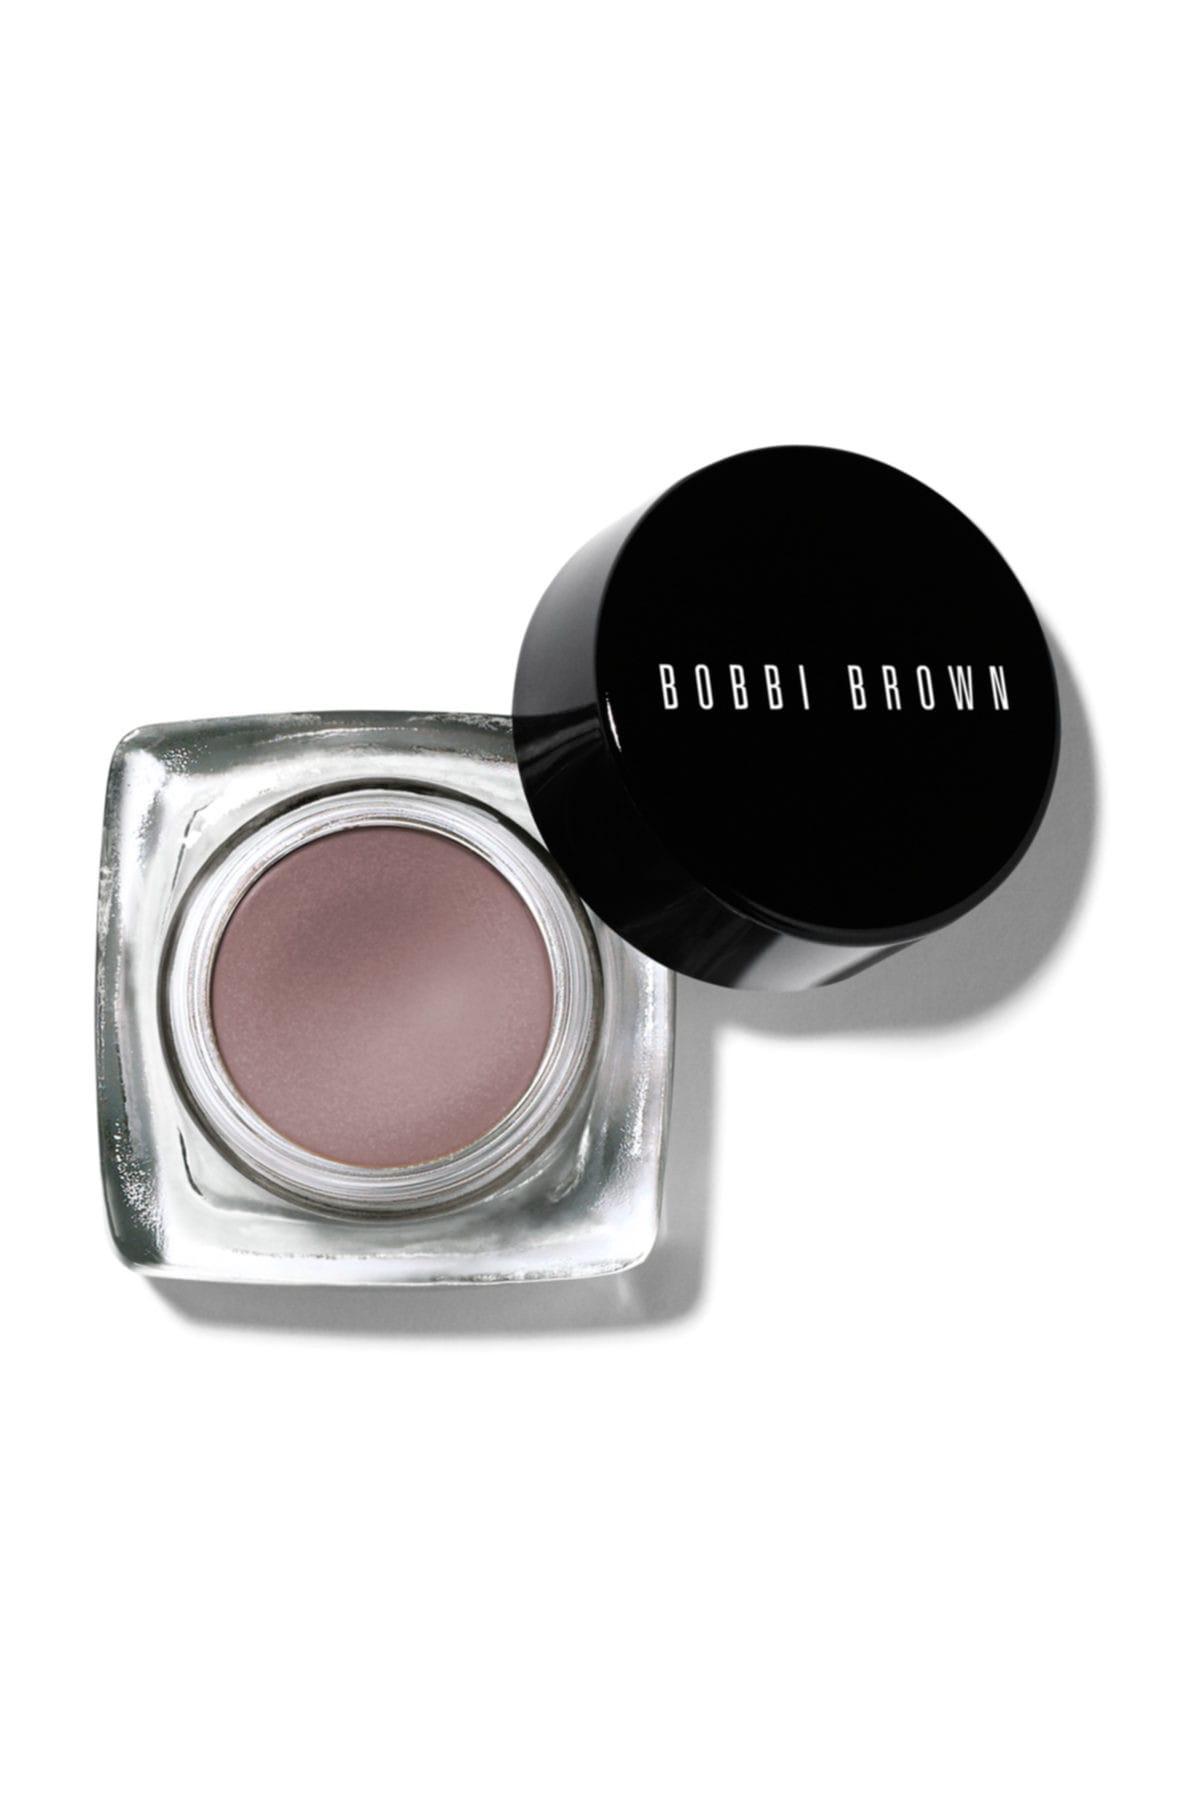 BOBBI BROWN Krem Göz Farı - Long Wear Cream Shadow Heather 30 3.5 g 716170068558 1